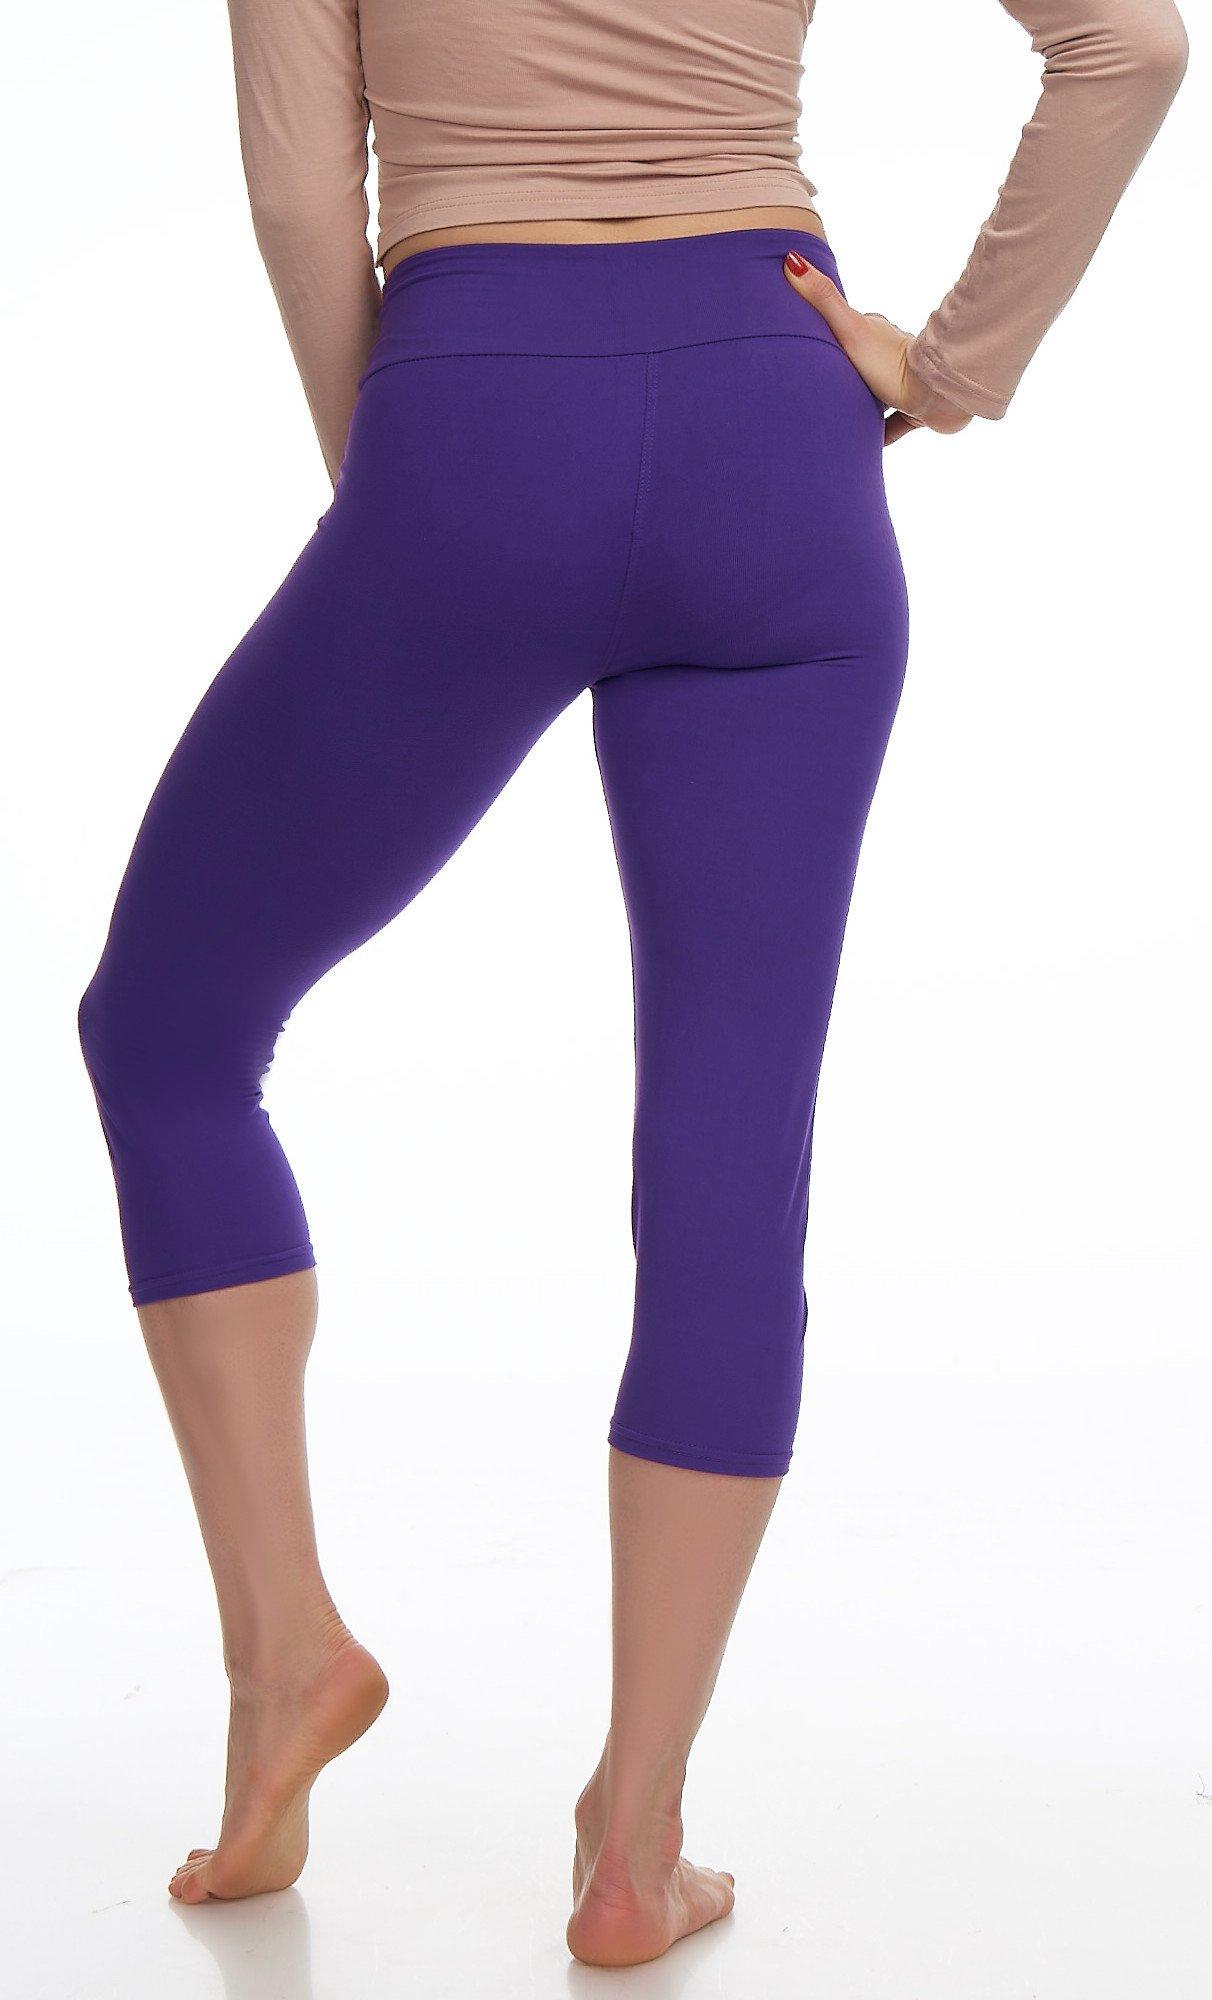 Lush Moda Extra Soft Leggings Variety of ColorsPlus Size Yoga Waist Purple, One Size fits Most (XL 3XL), Purple Yoga Waist by LMB (Image #7)